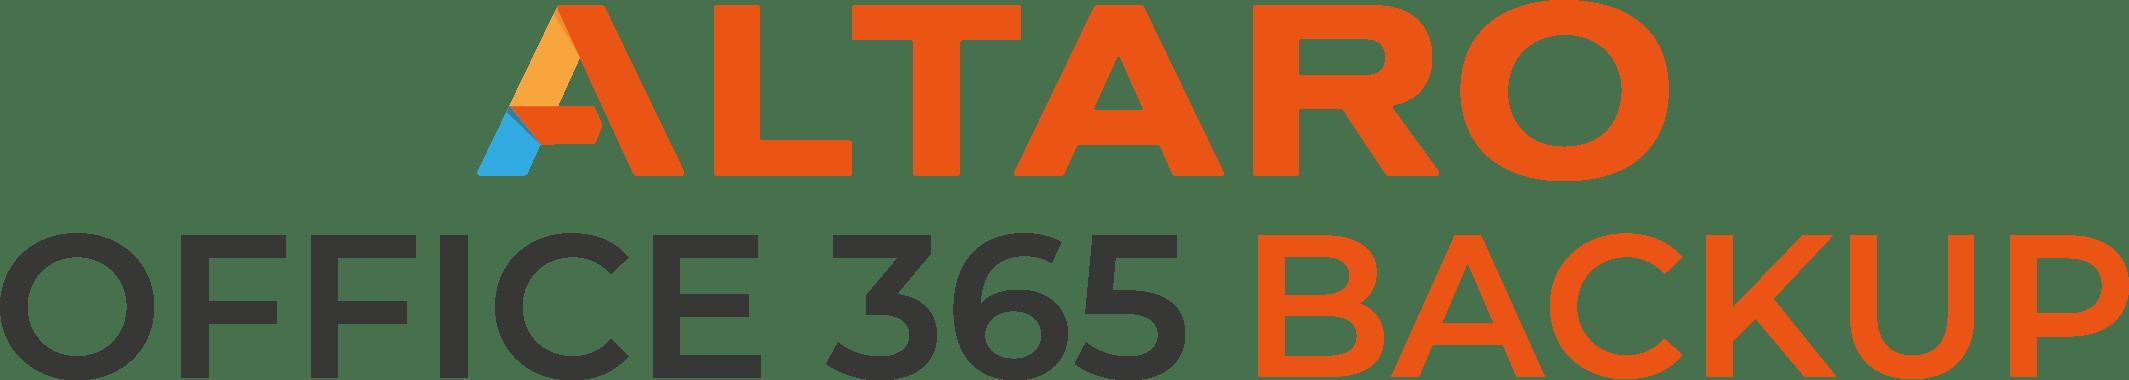 Altaro Office 365 logo